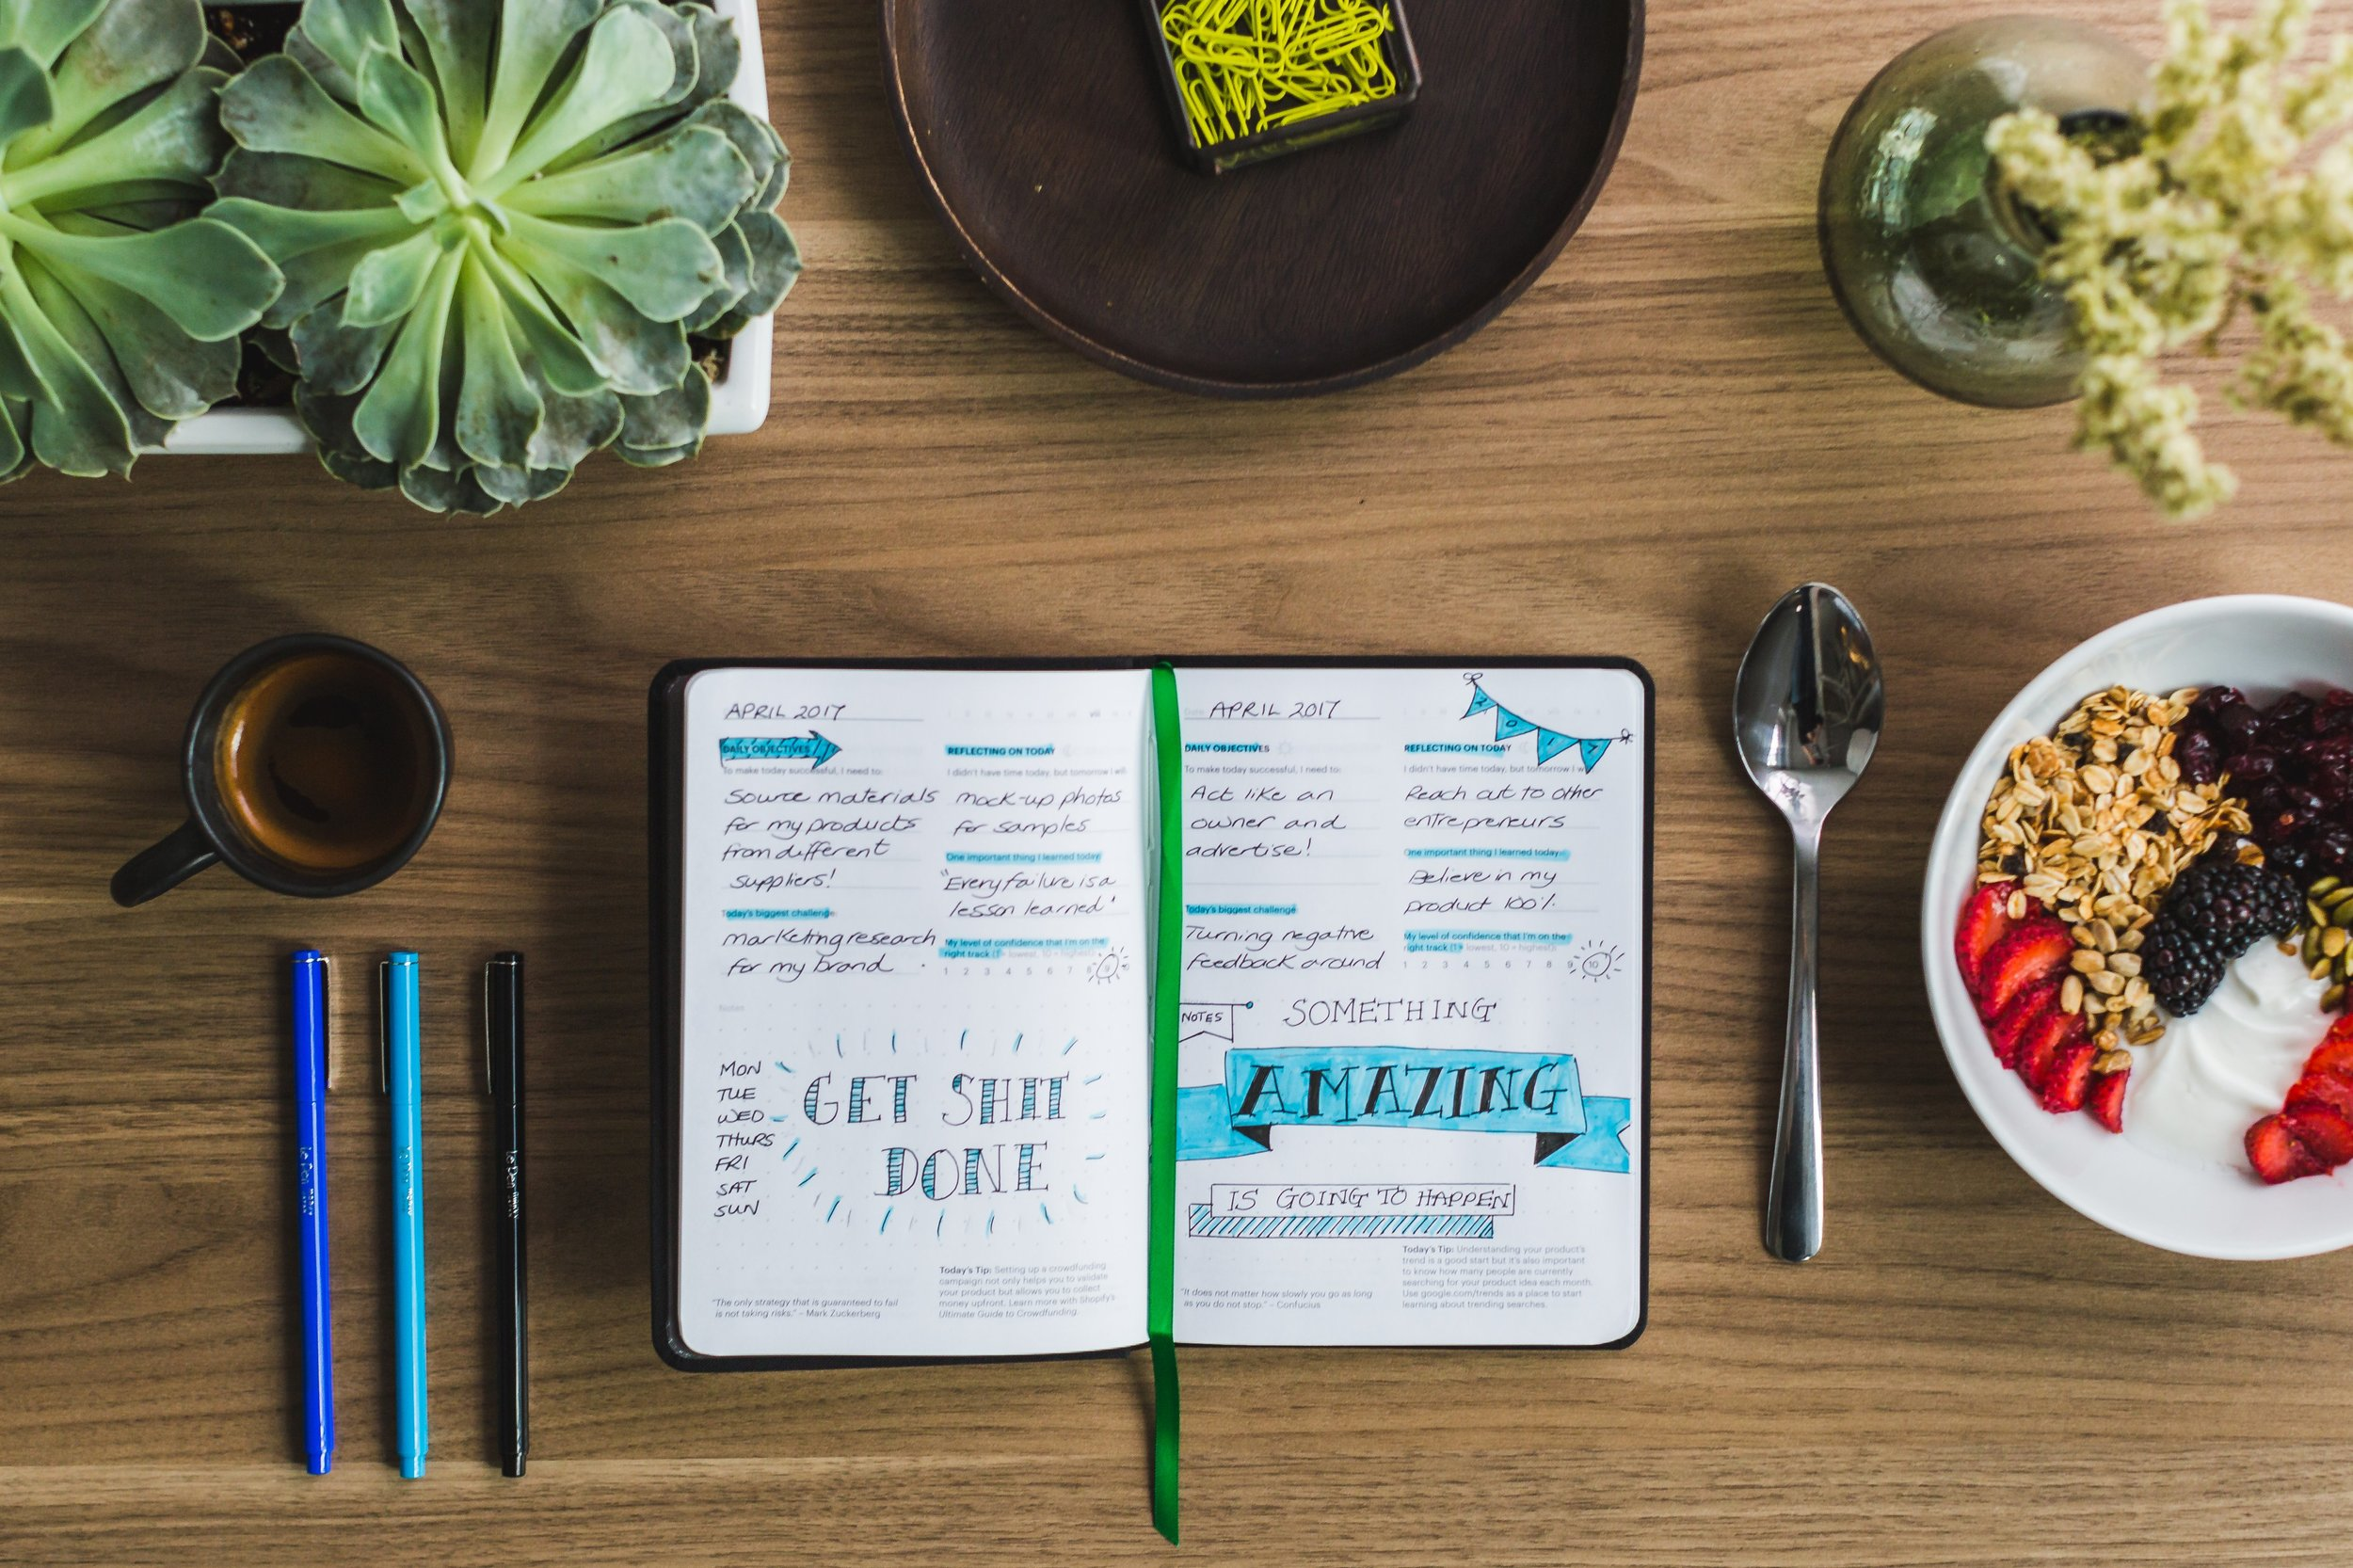 journaling-at-breakfast_4460x4460.jpg